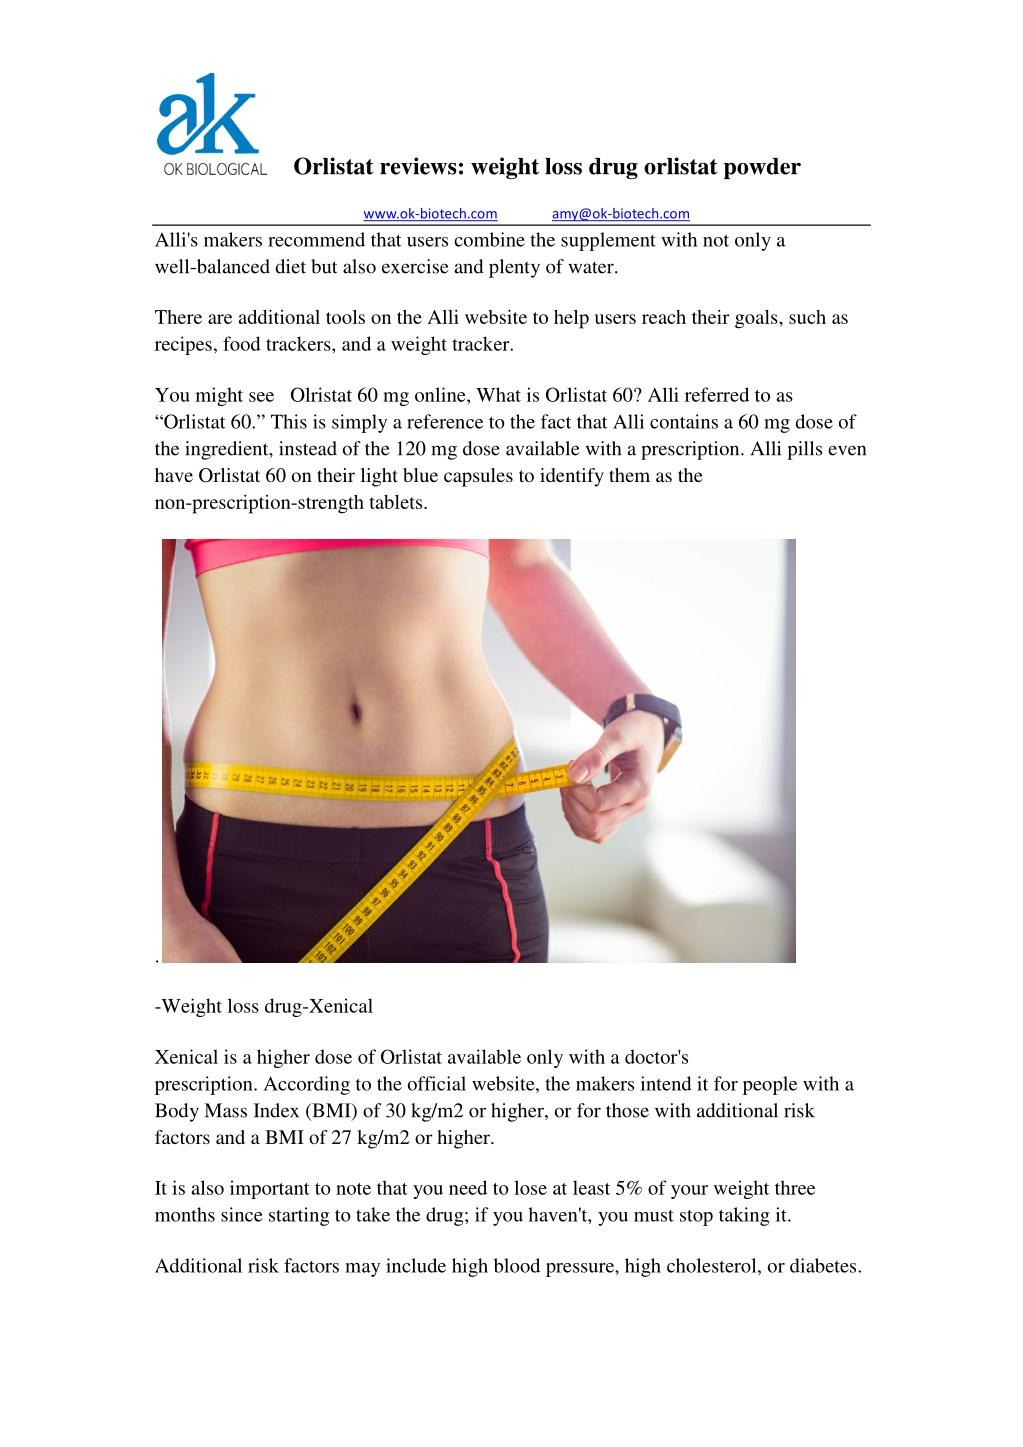 PPT - Orlistat reviews: weight loss drug orlistat powder